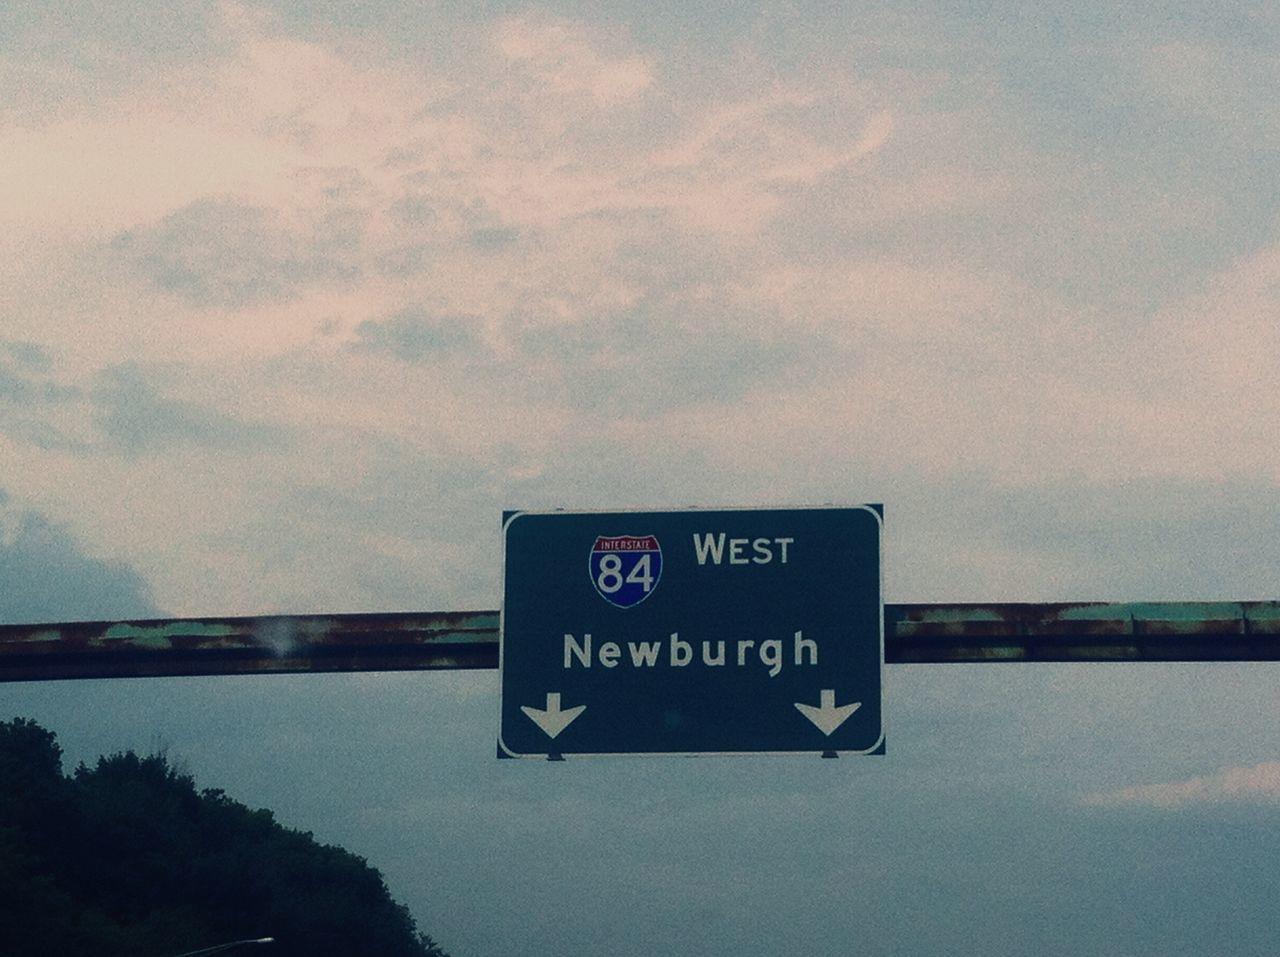 Nbny Newburgh Newburgh New York Newburghny Upstateny Signs Orange County Ny Color Photography New York NYS